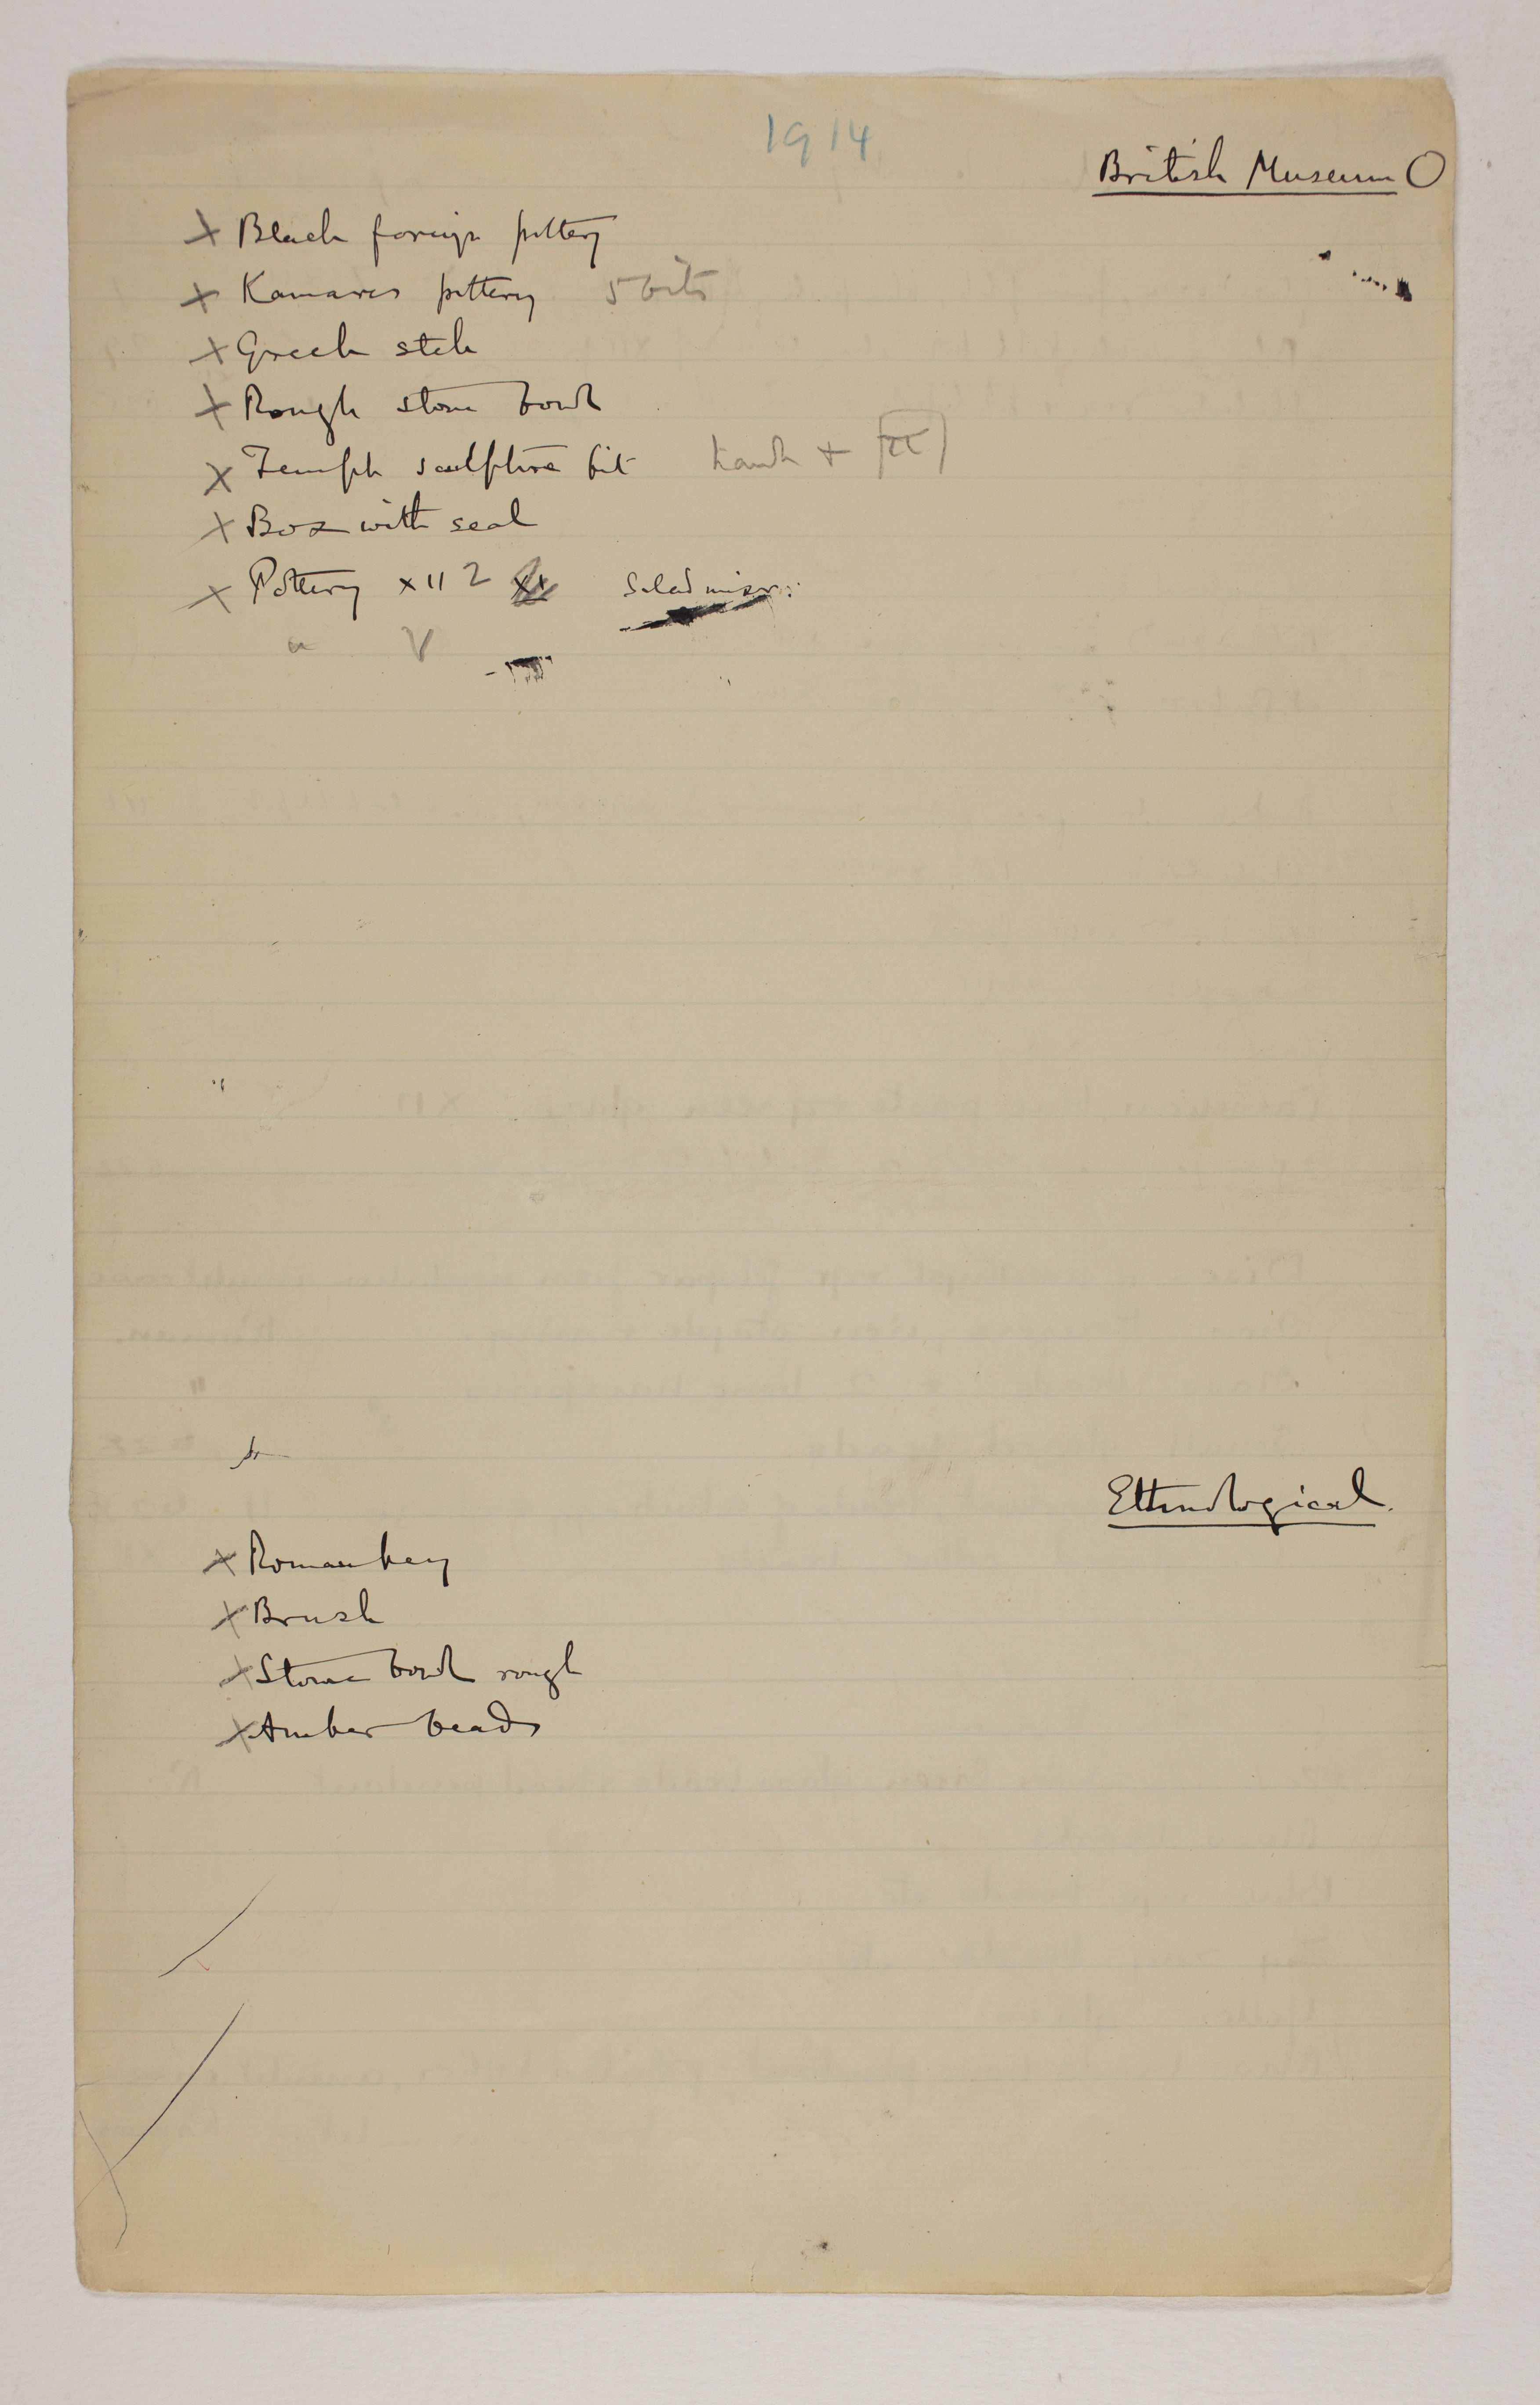 1913-14 Lahun, Haraga Multiple institution list  PMA/WFP1/D/22/44.2